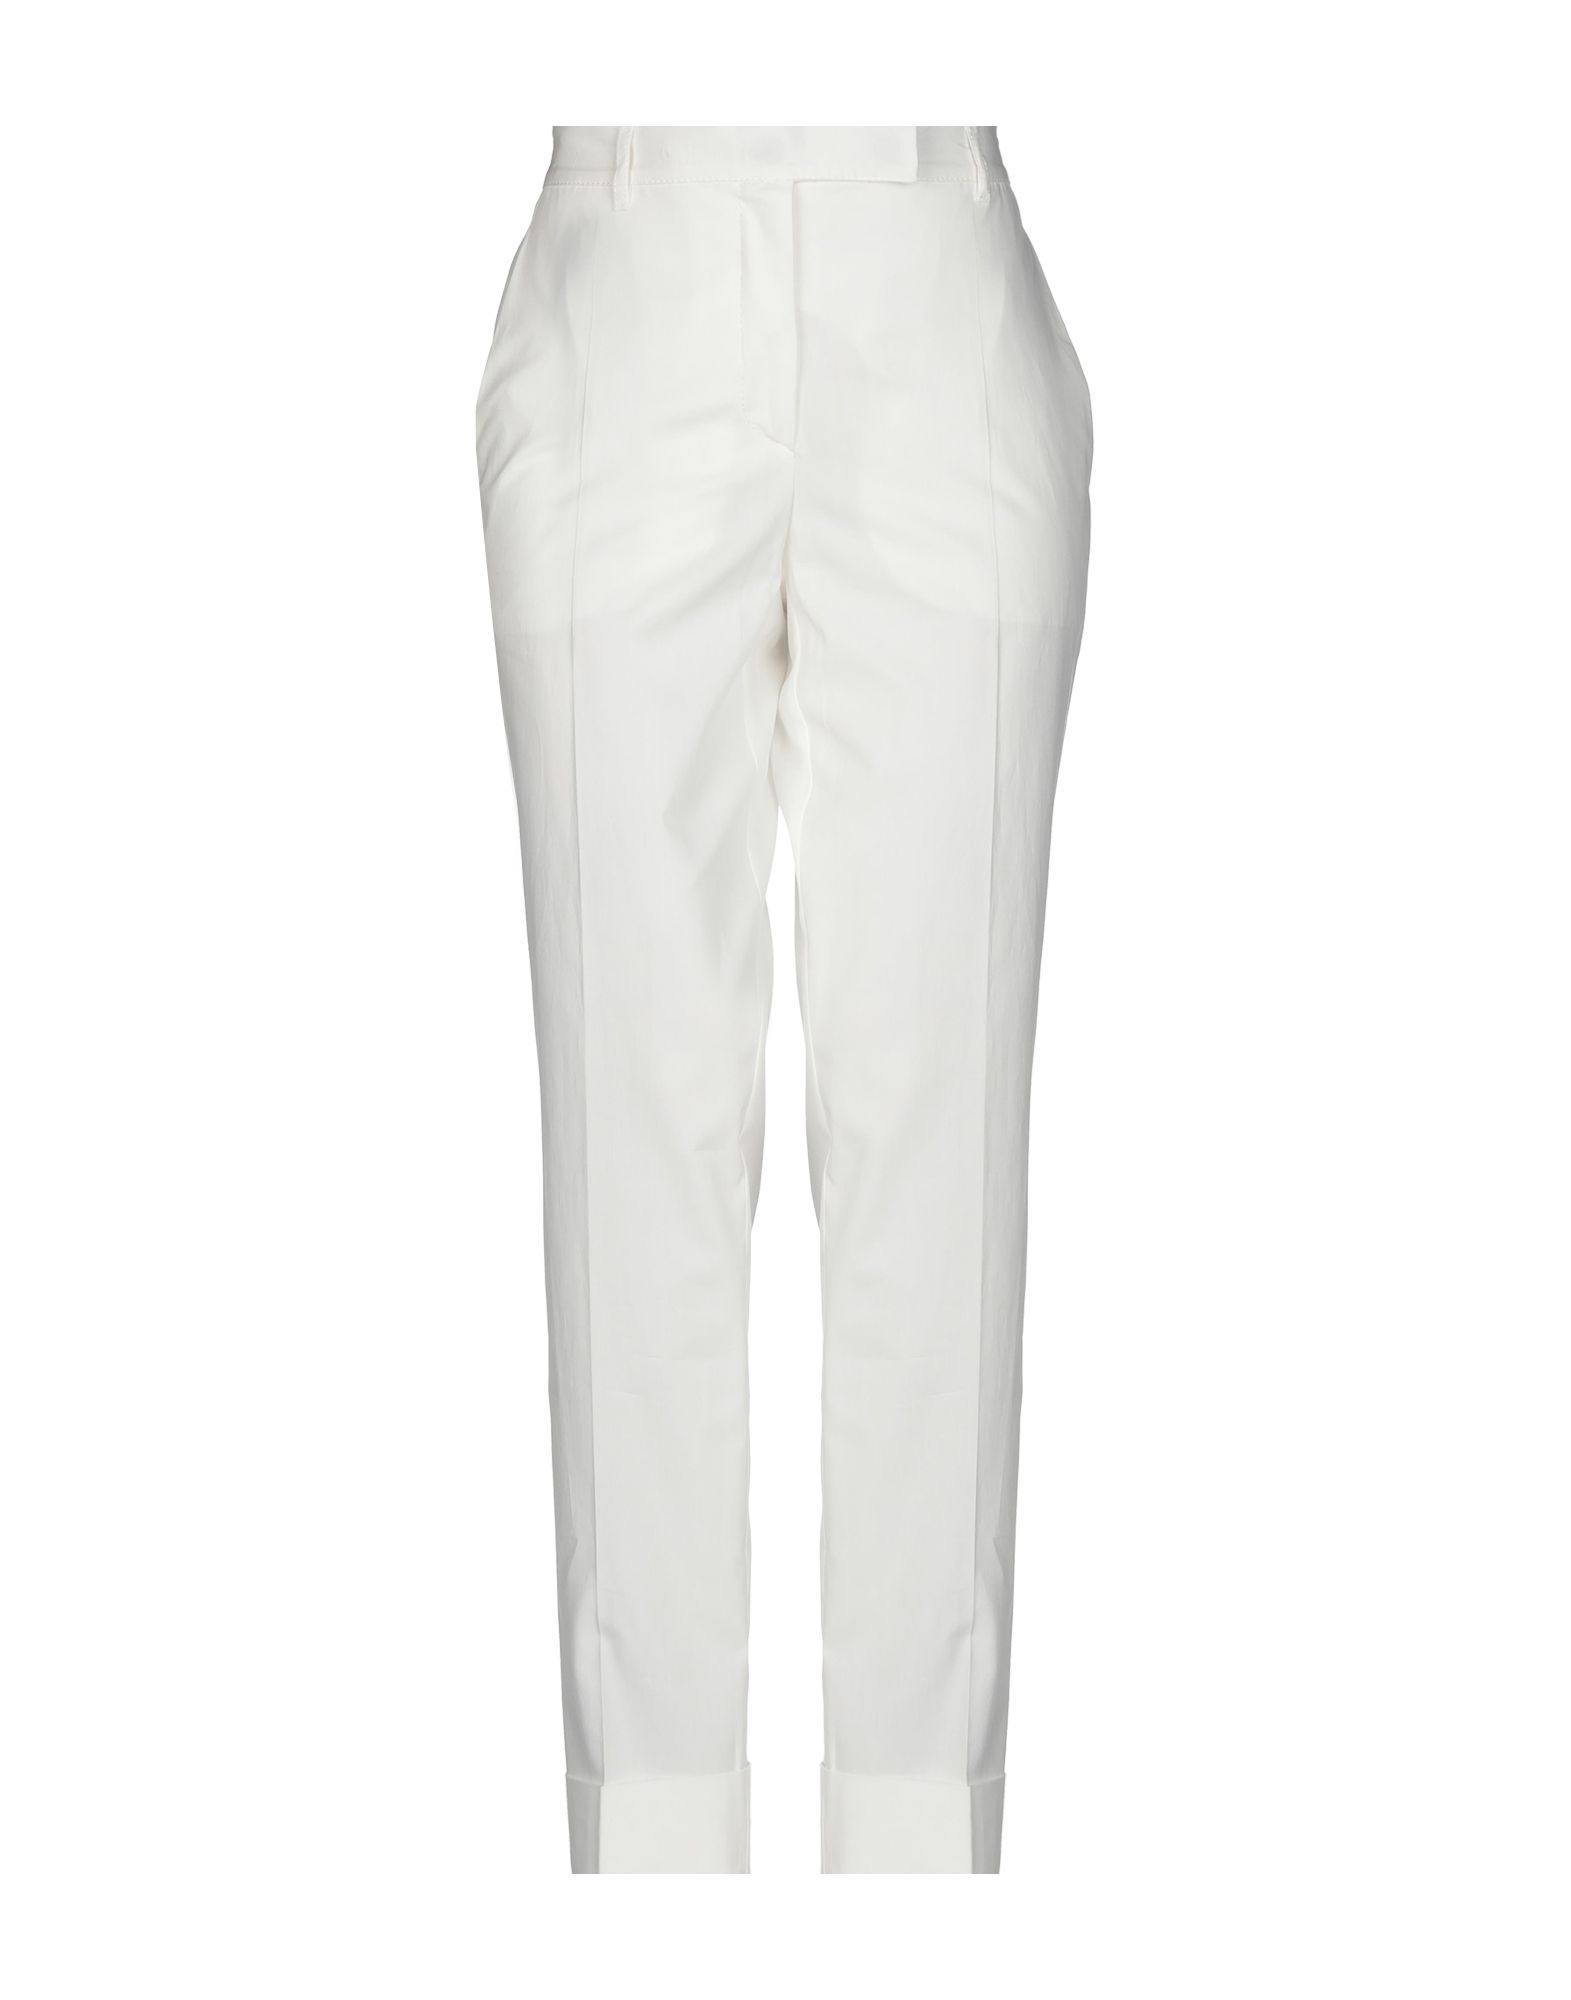 Pantalone Philosophy Di Lorenzo Serafini donna - 13274627EF 13274627EF  der niedrigste Preis